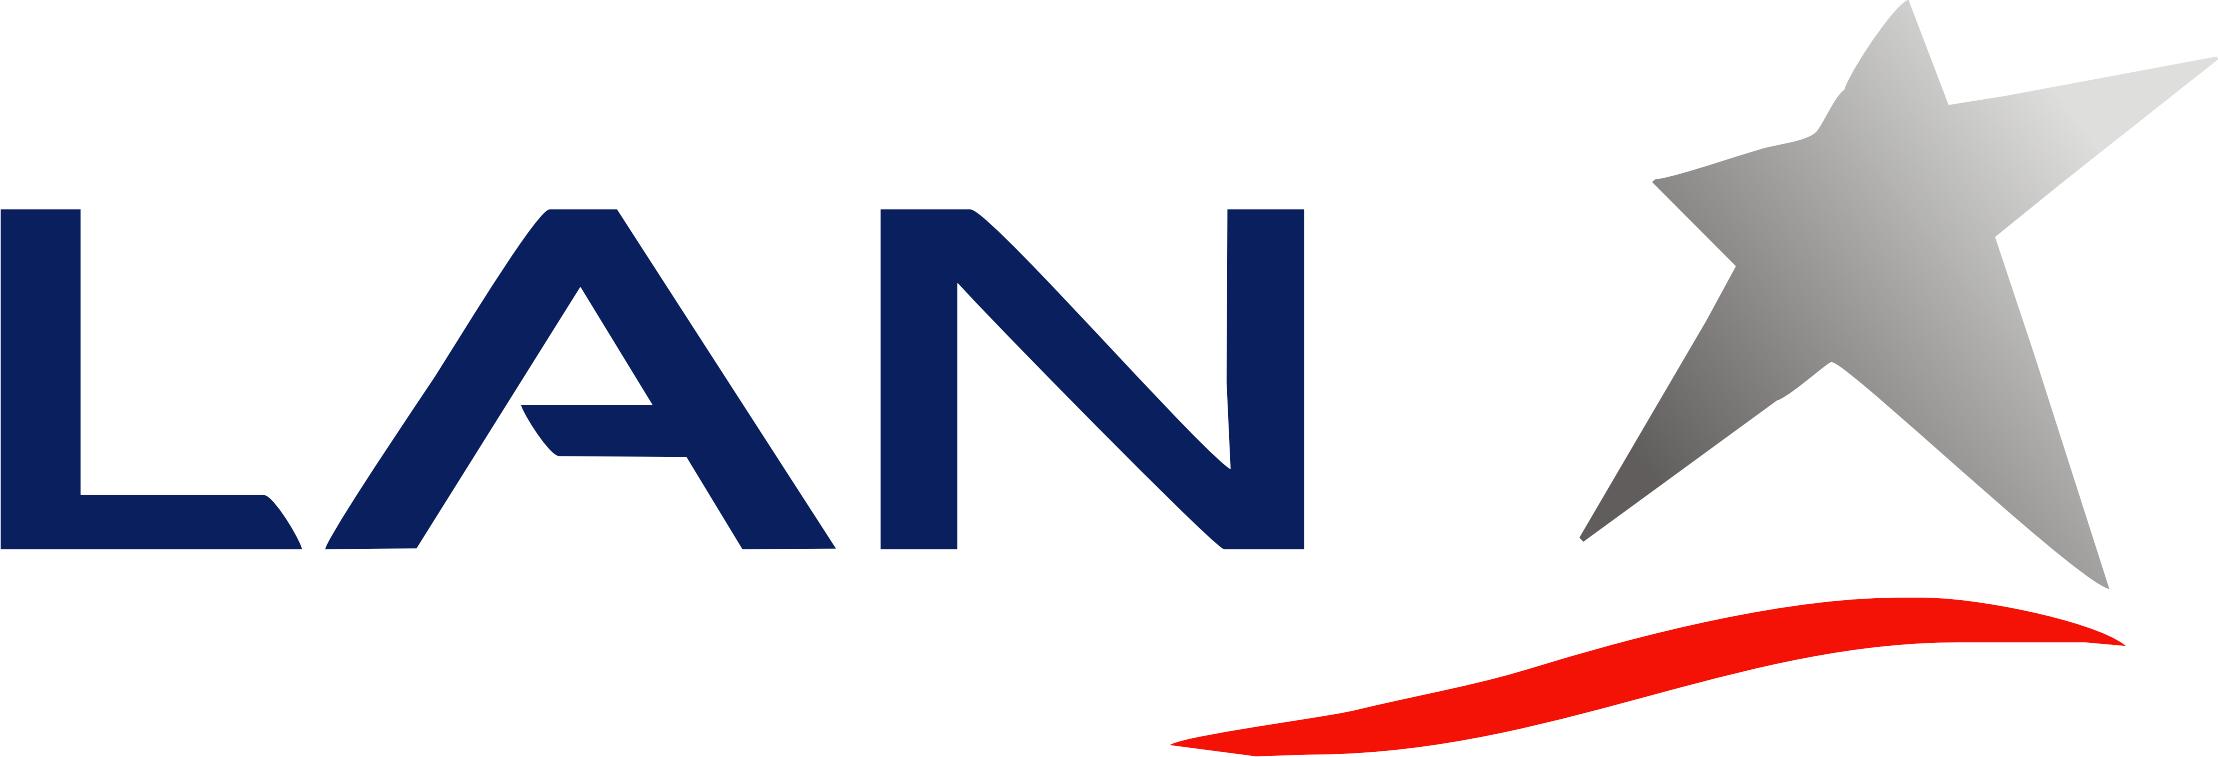 Resultado de imagen para lan logo